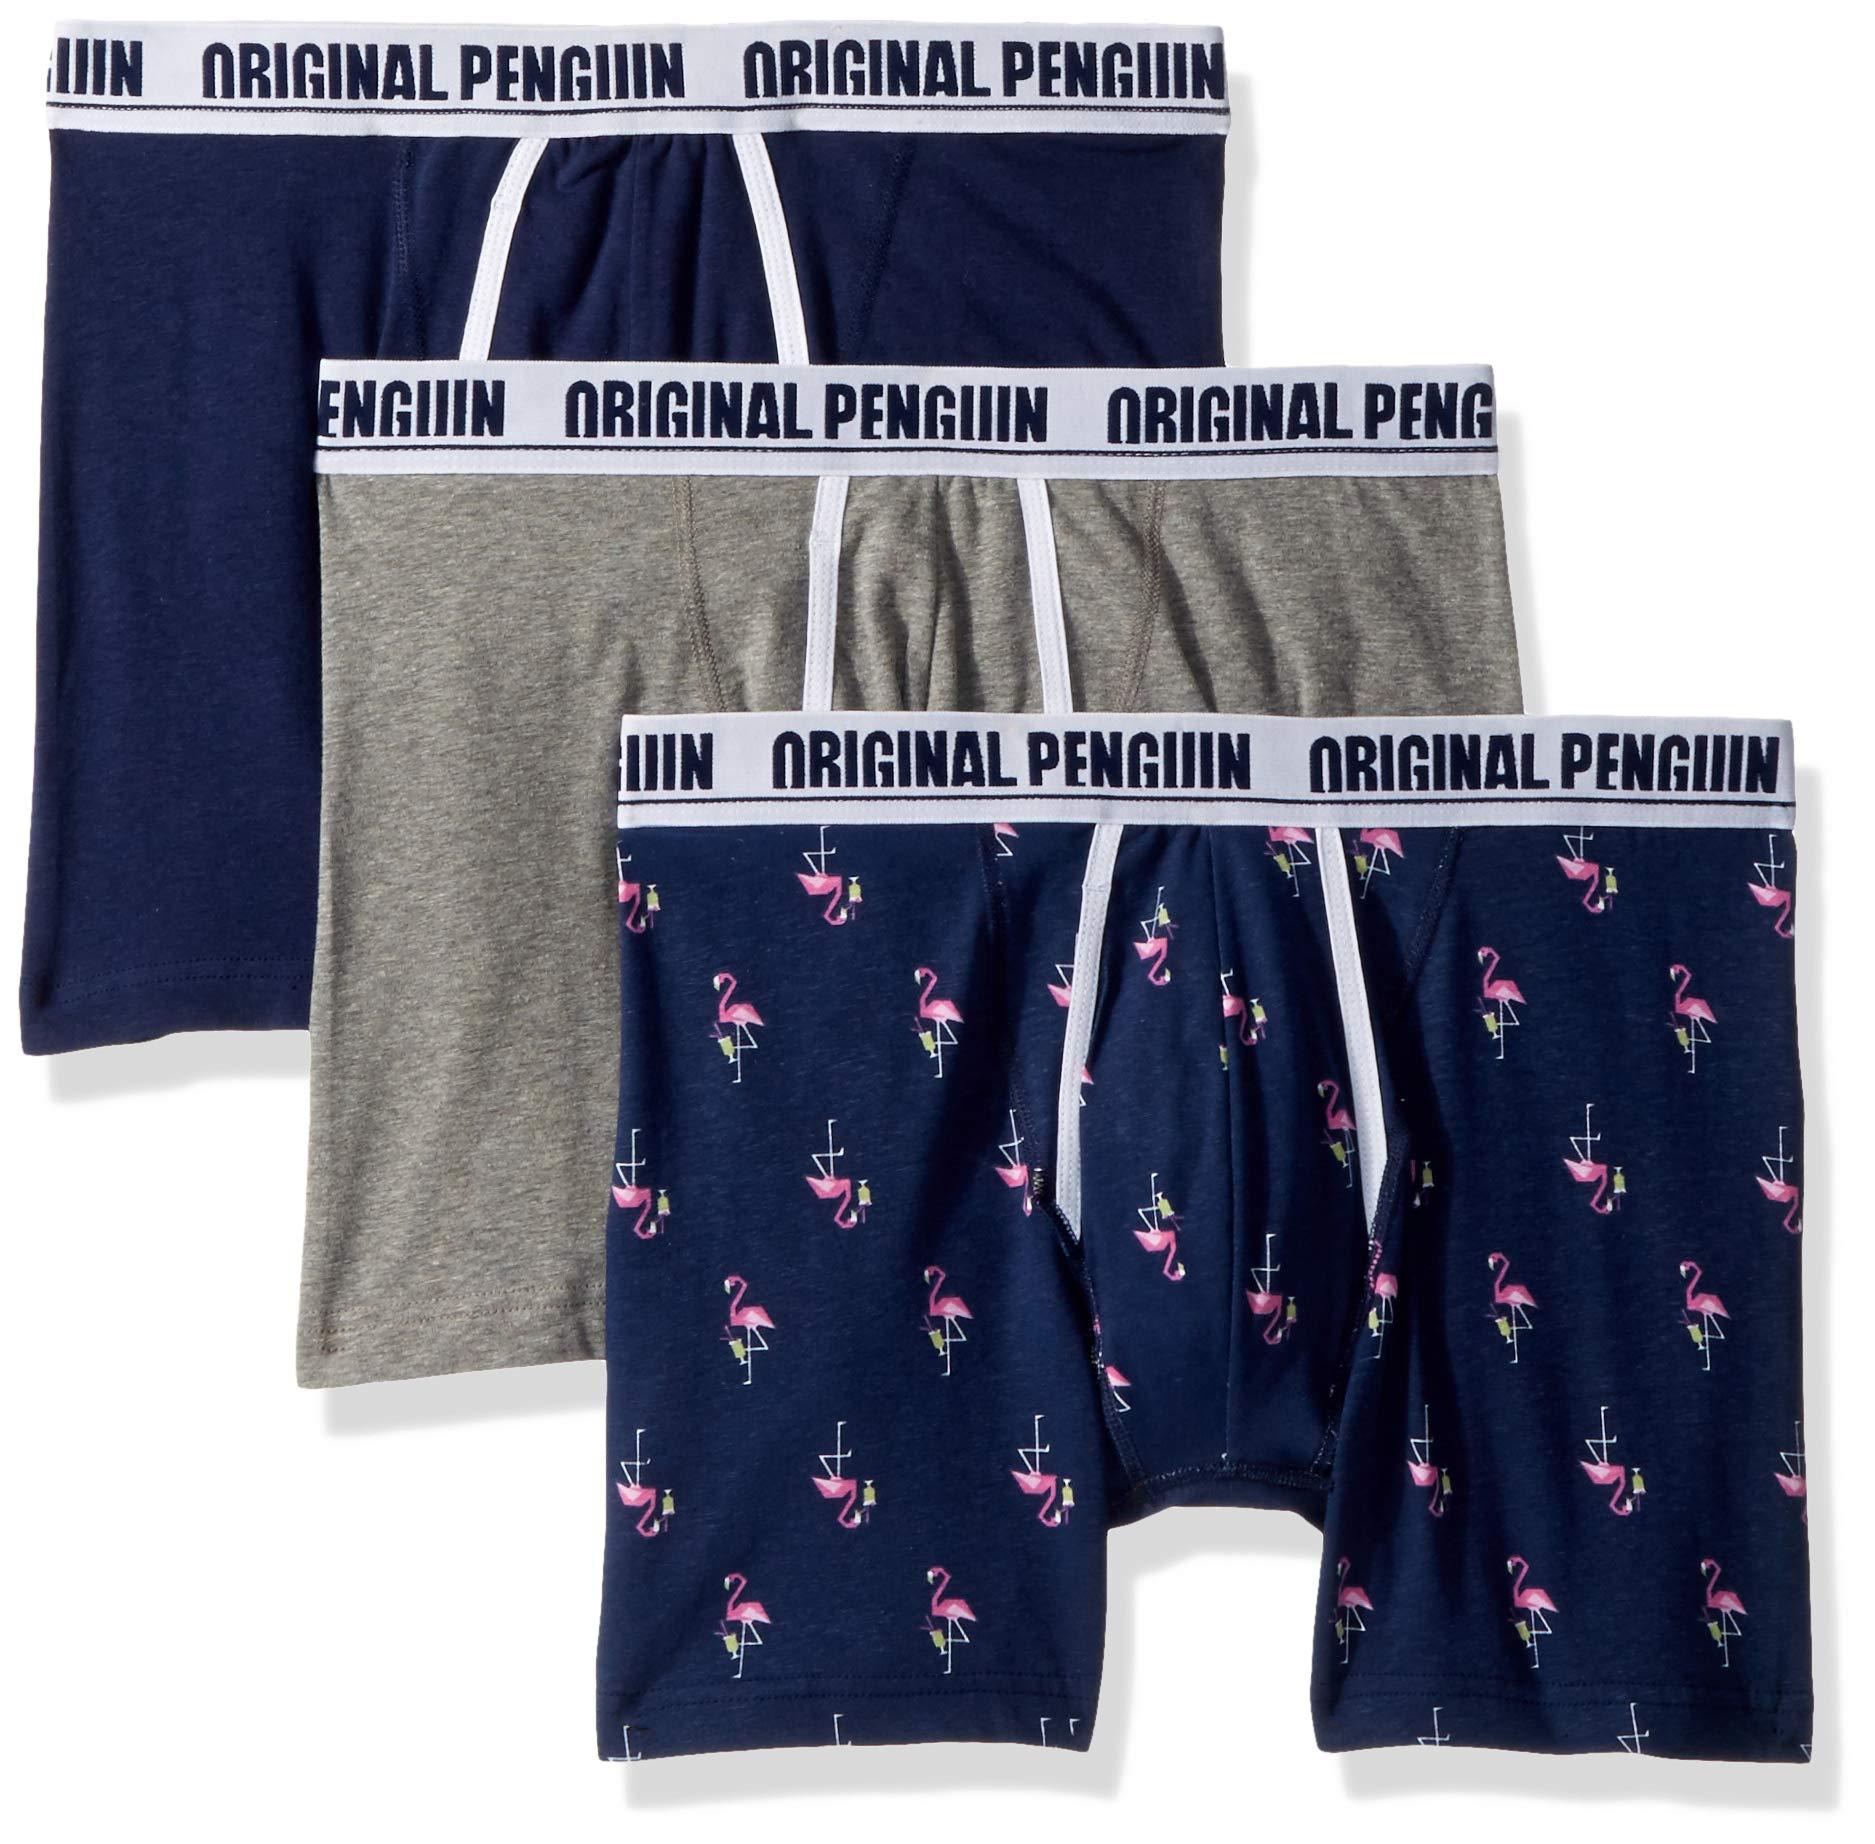 Original Penguin Men's Cotton Stretch 3 Pack Boxer Brief, Light Grey Heather, Medieval Blue, Blue, L